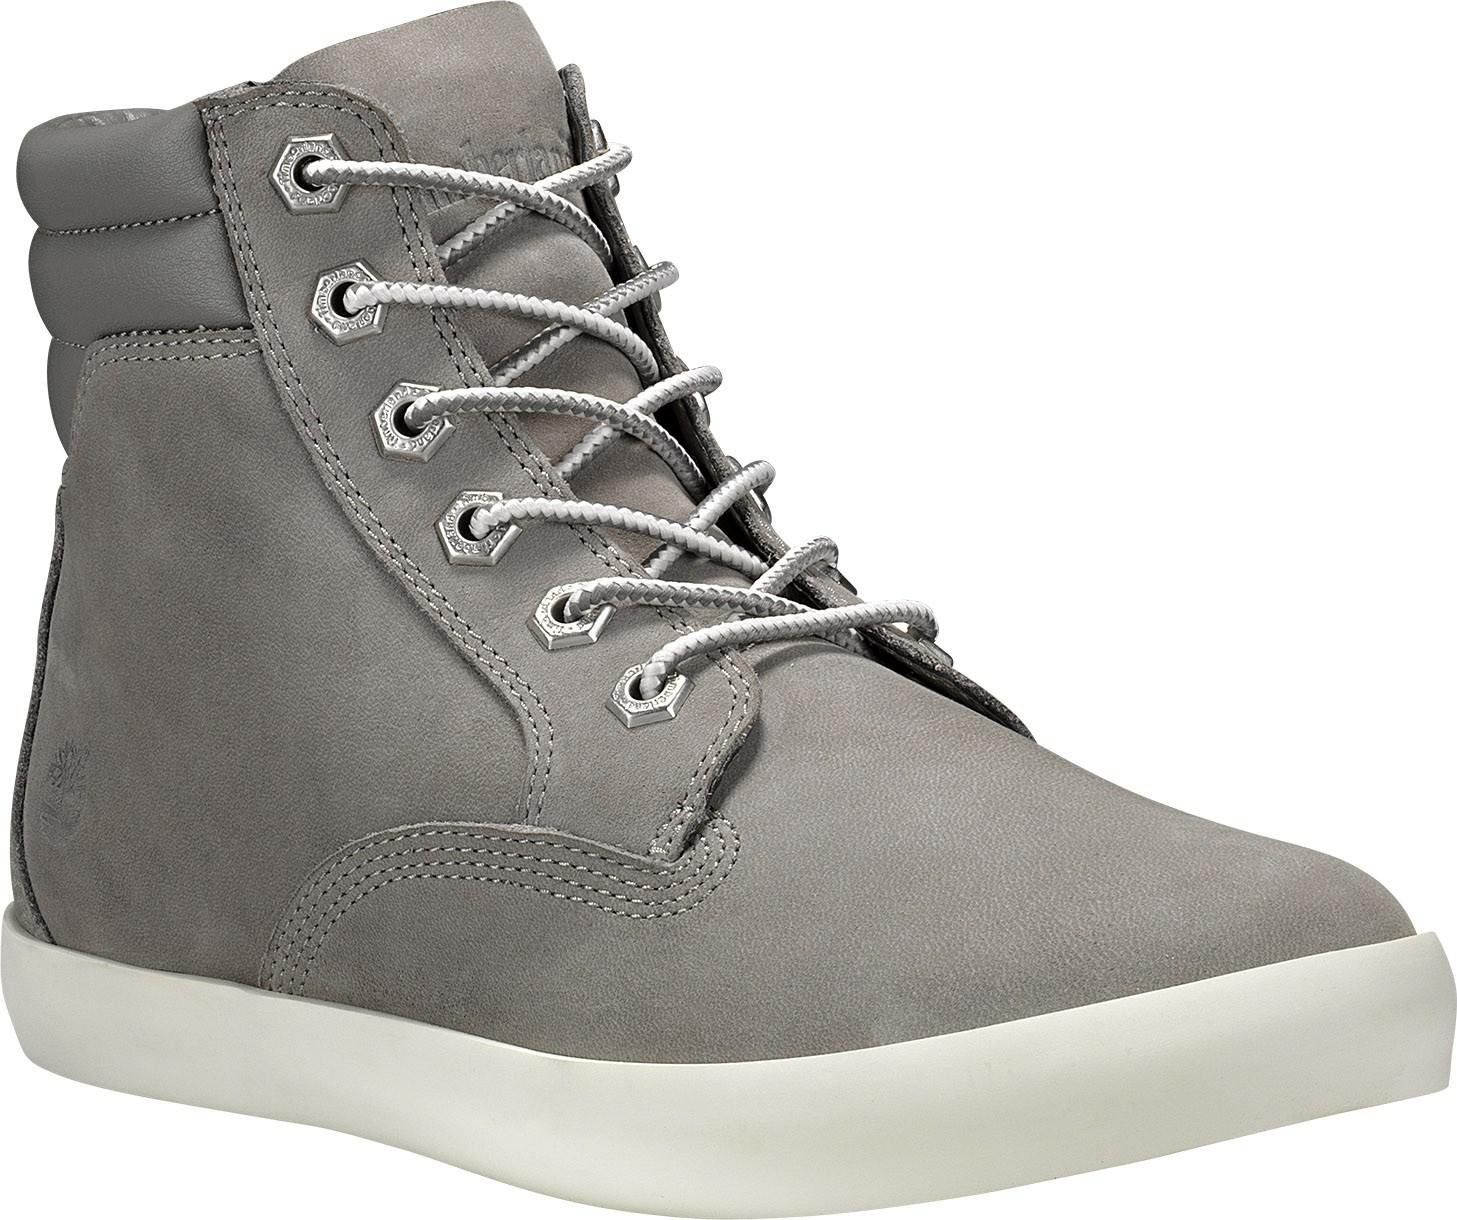 pretty nice b86f0 534c0 Timberland - Sneaker Damen